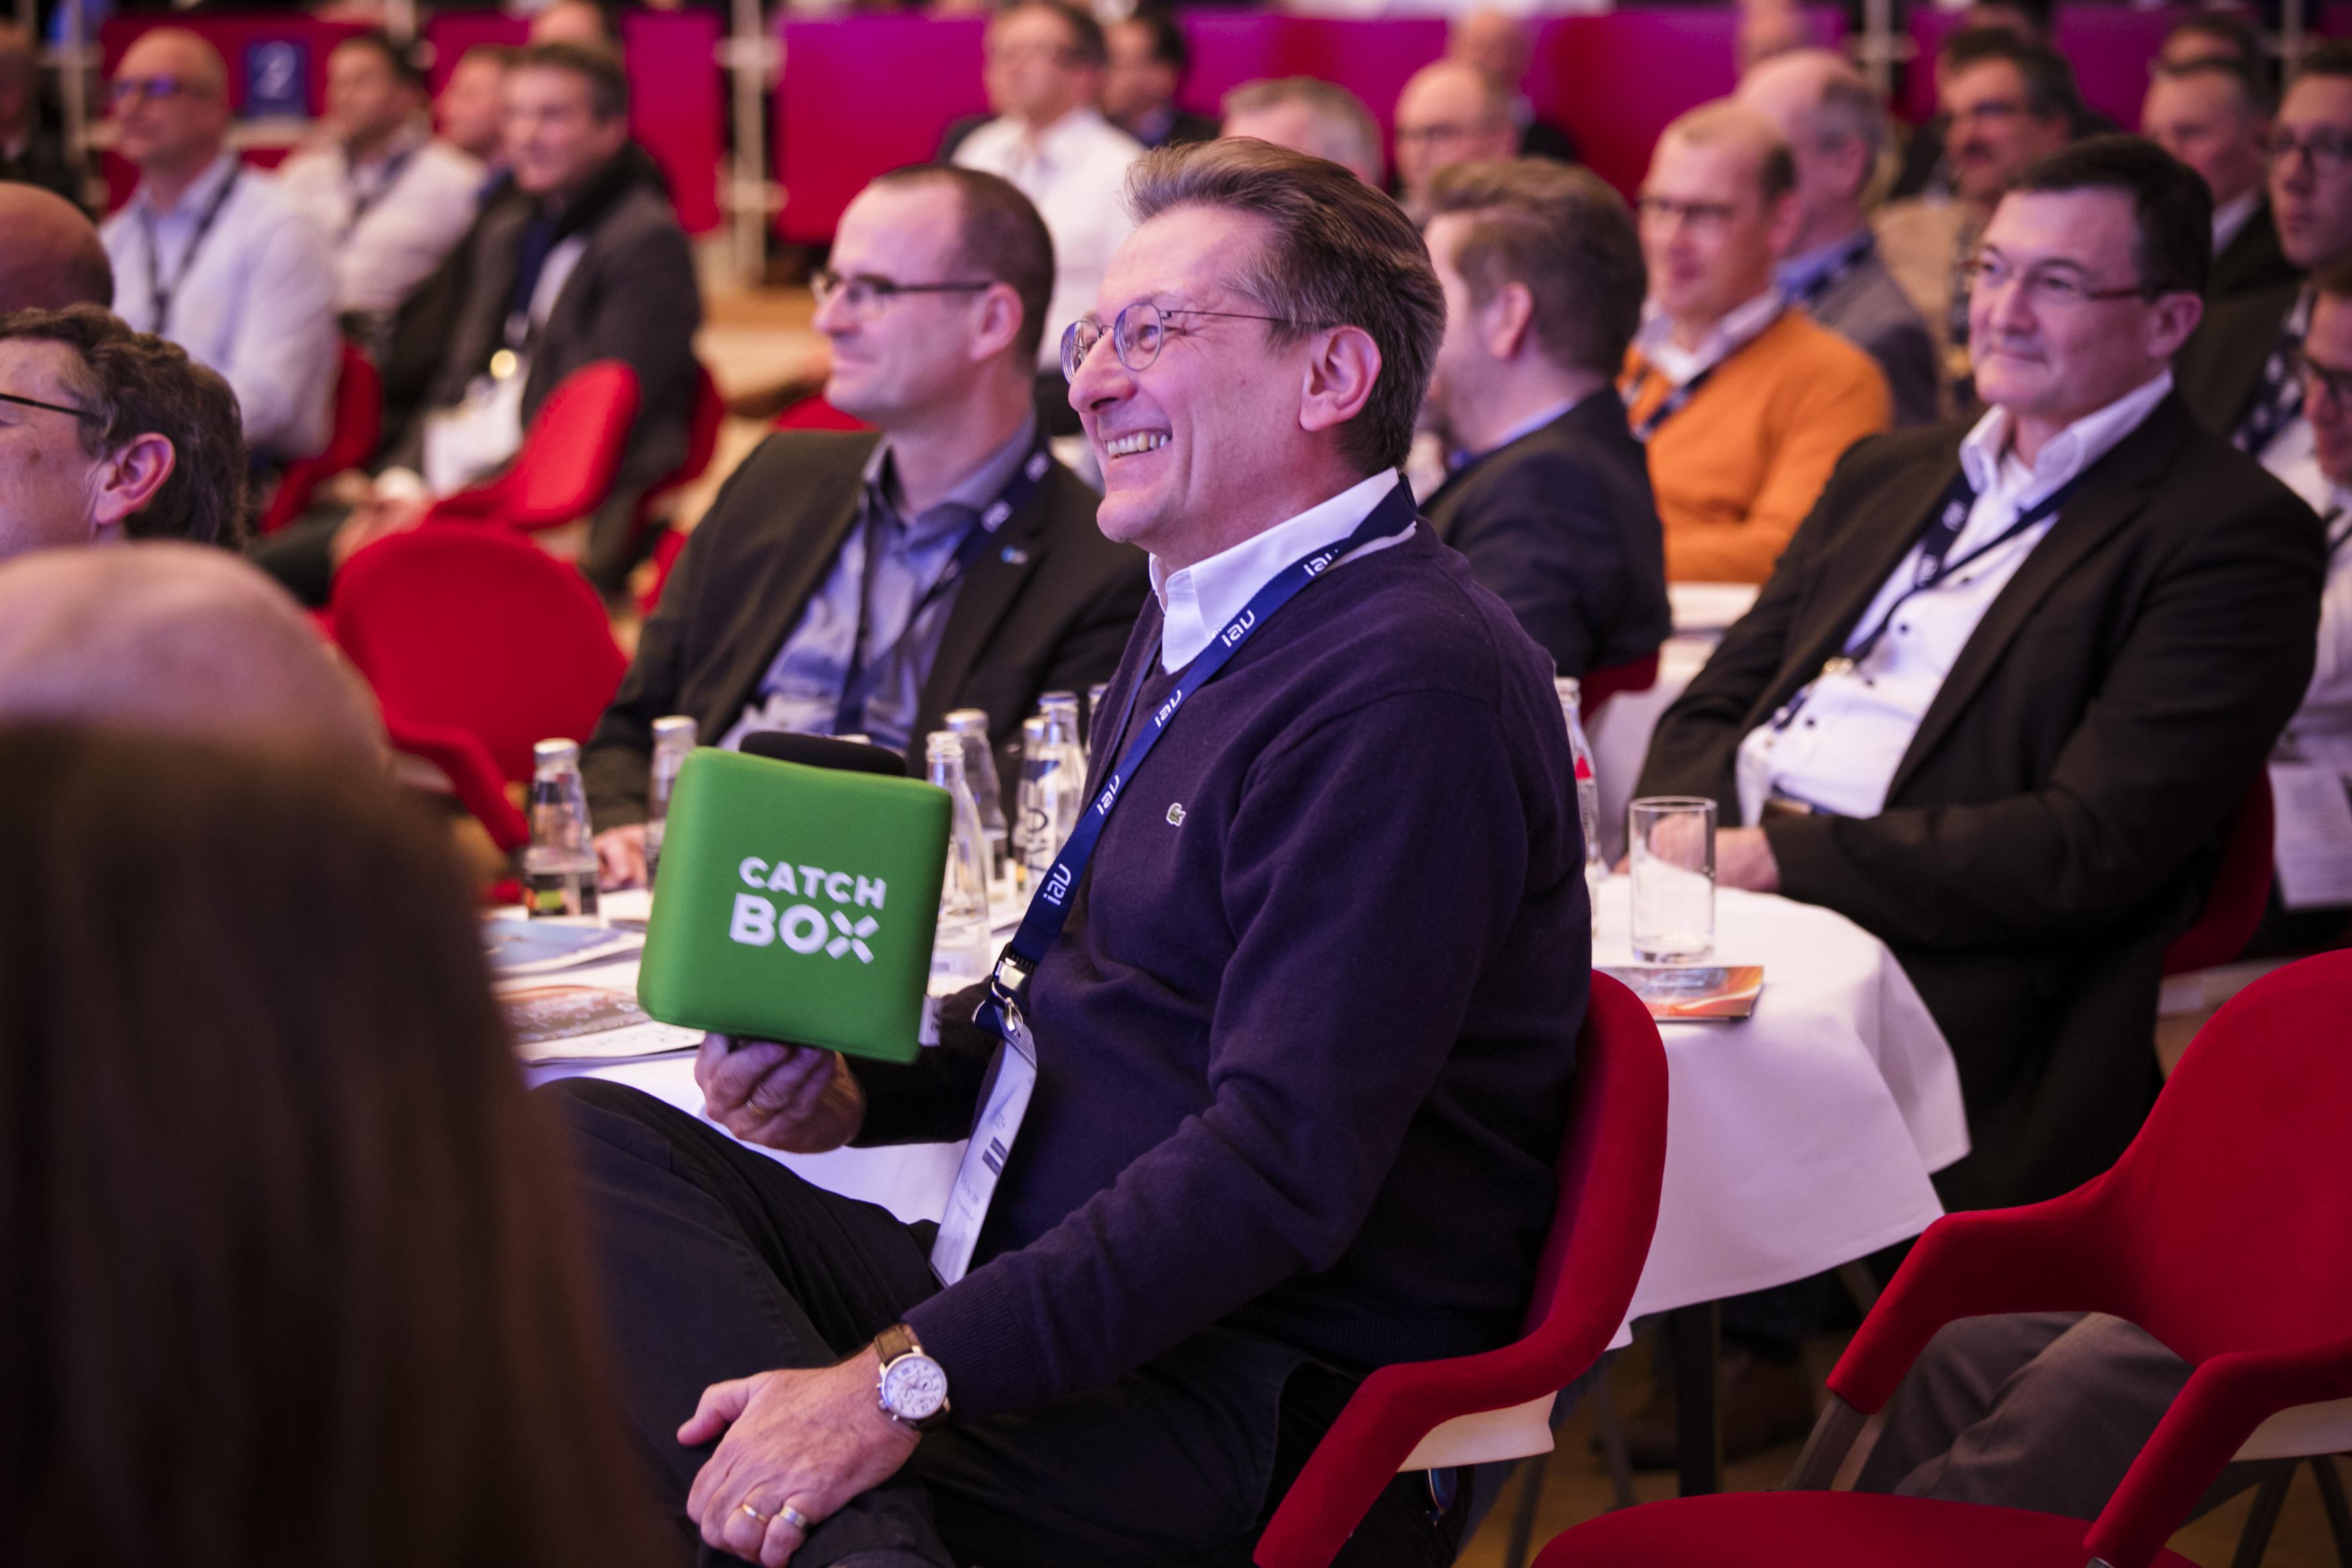 IAV_Führungskräftetreffen_FKT_2019_inspiranten013